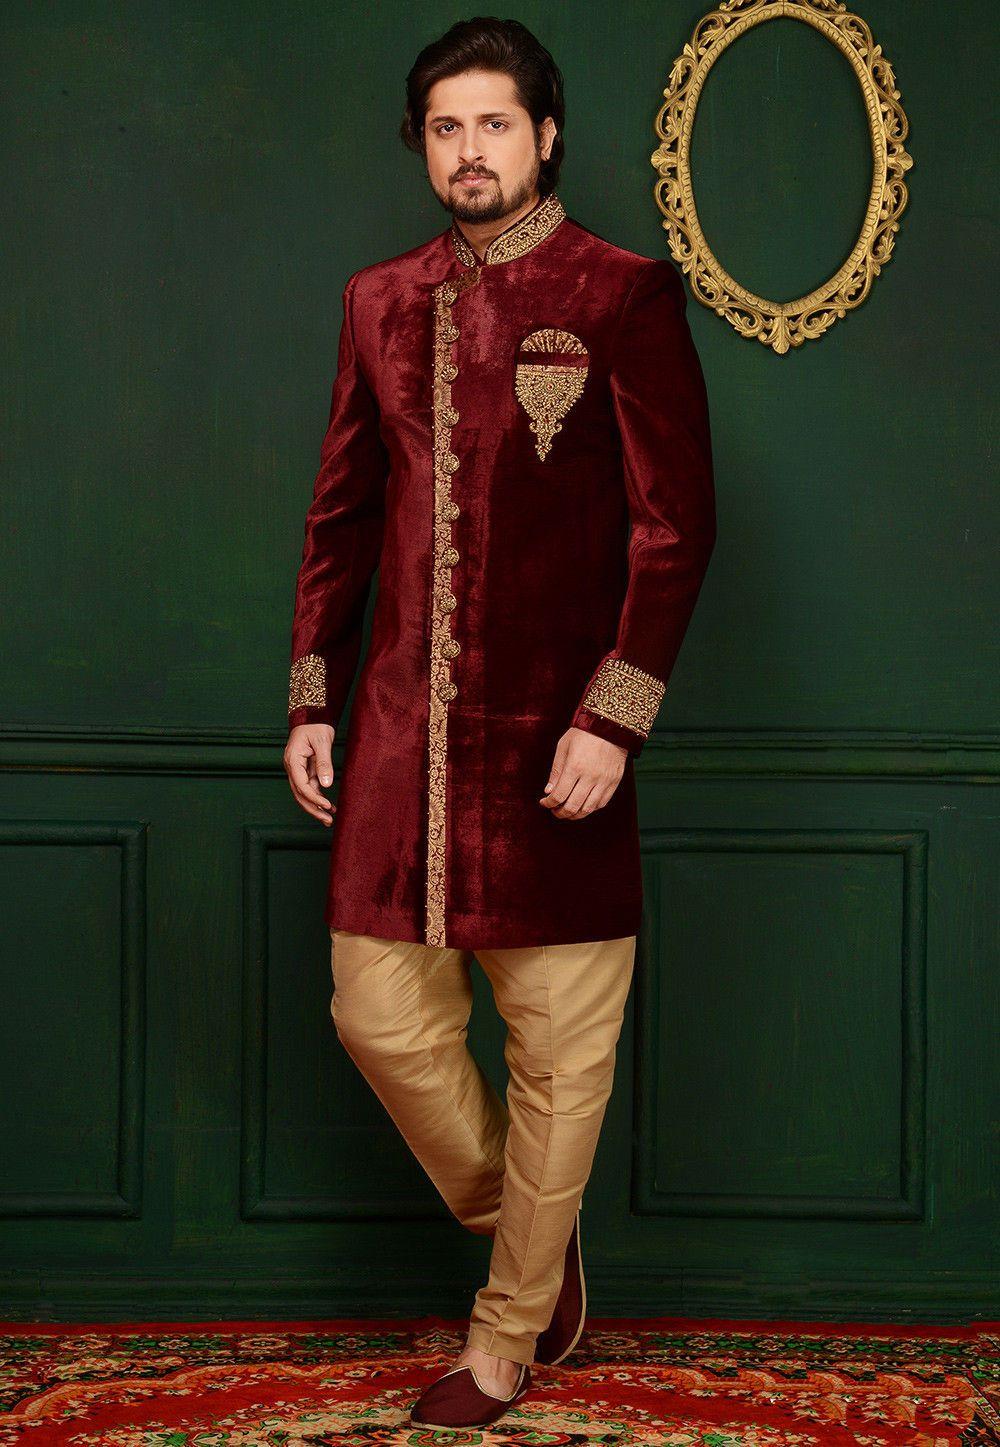 Hand Embroidered Velvet Sherwani In Maroon Traditional Indian Mens Clothing Sherwani Maroon Wedding